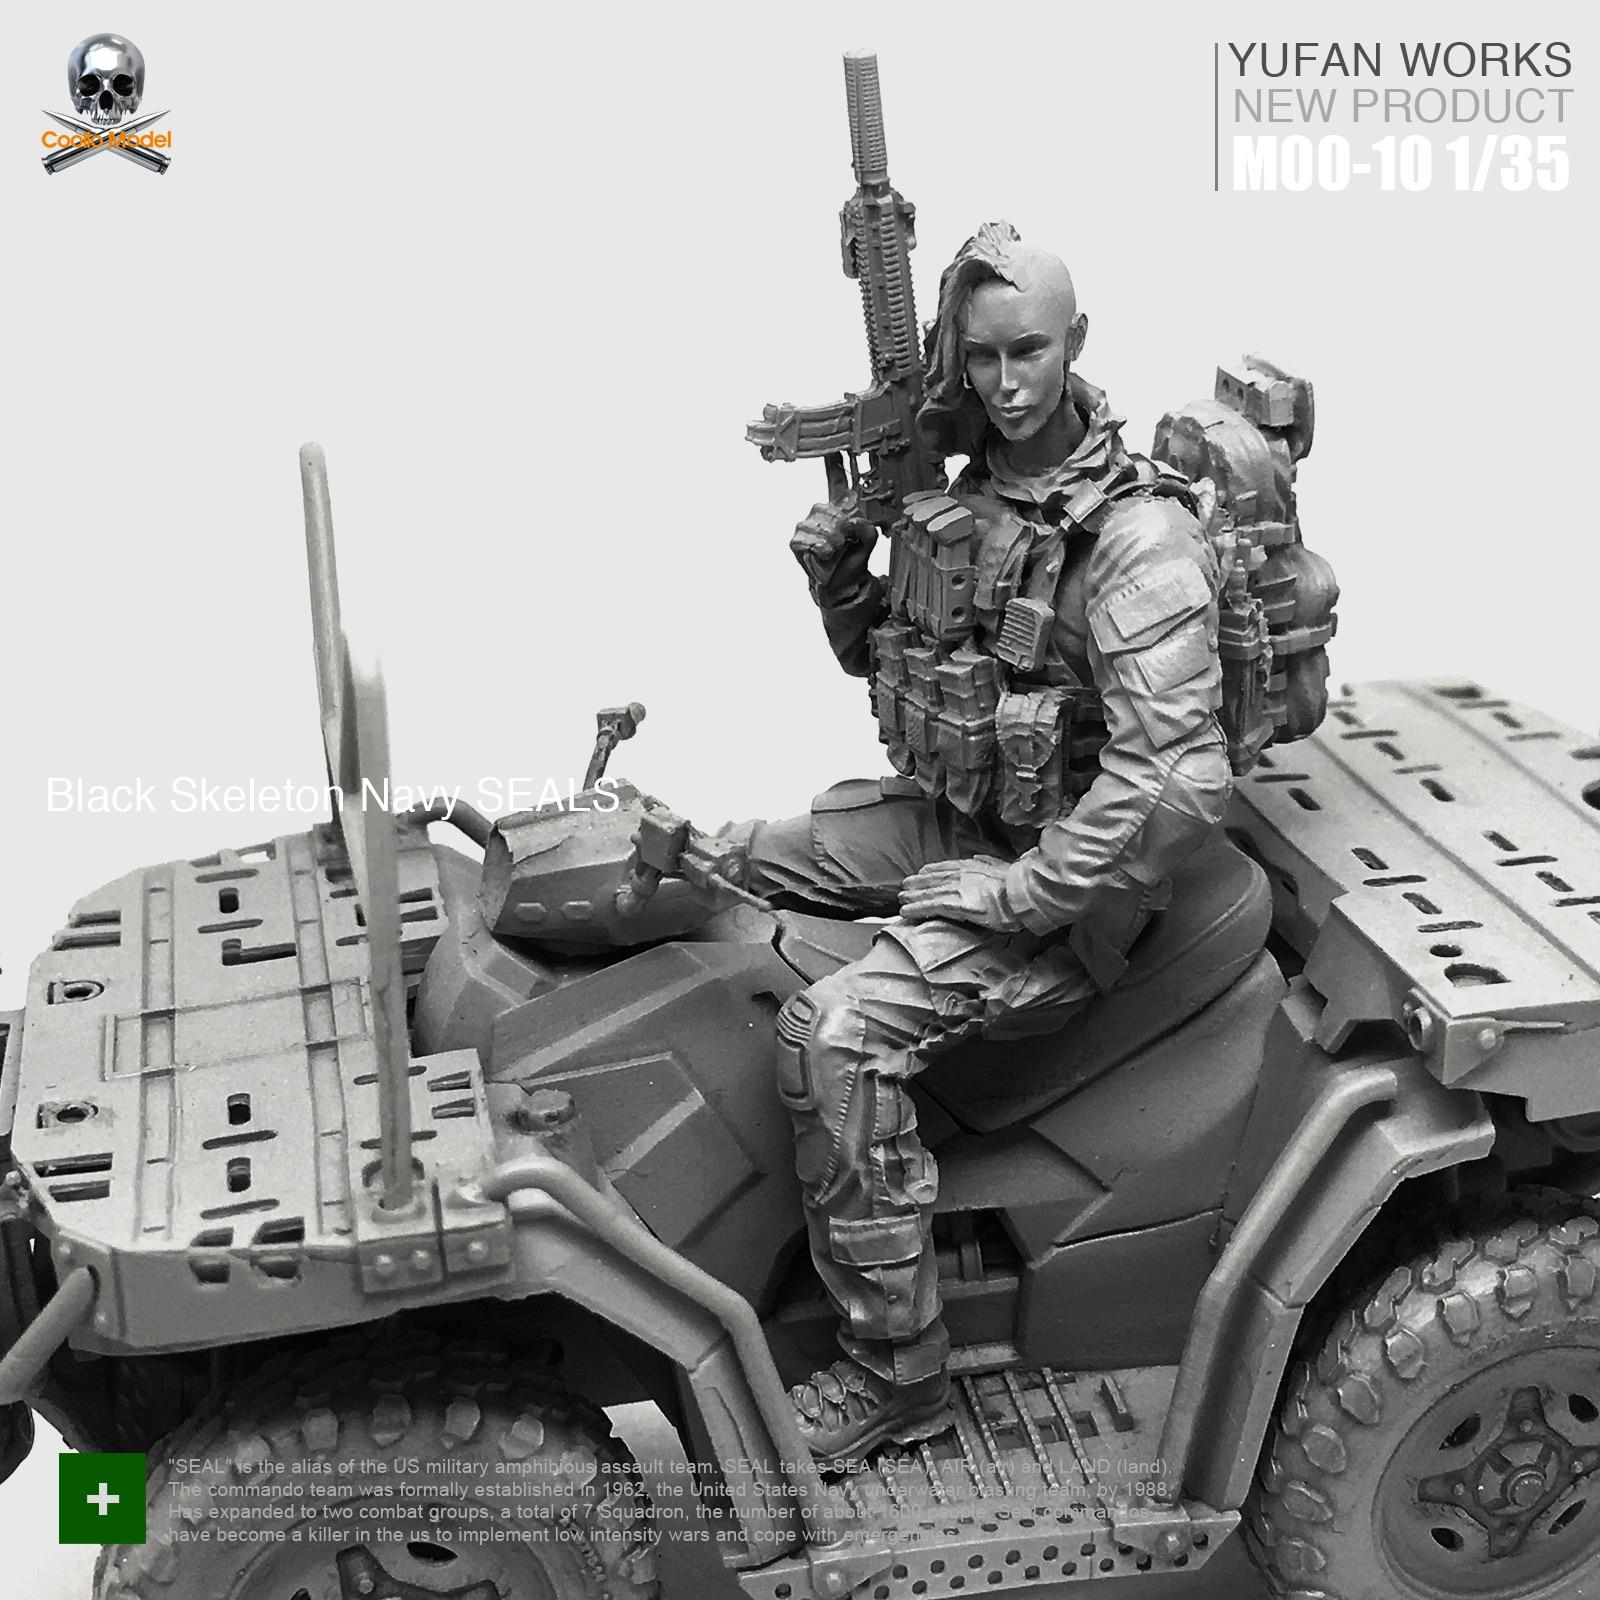 Yufan Model 1 35 Resin Figure Female Soldier Terrain Car US Military Seal Commando Beauty Driver